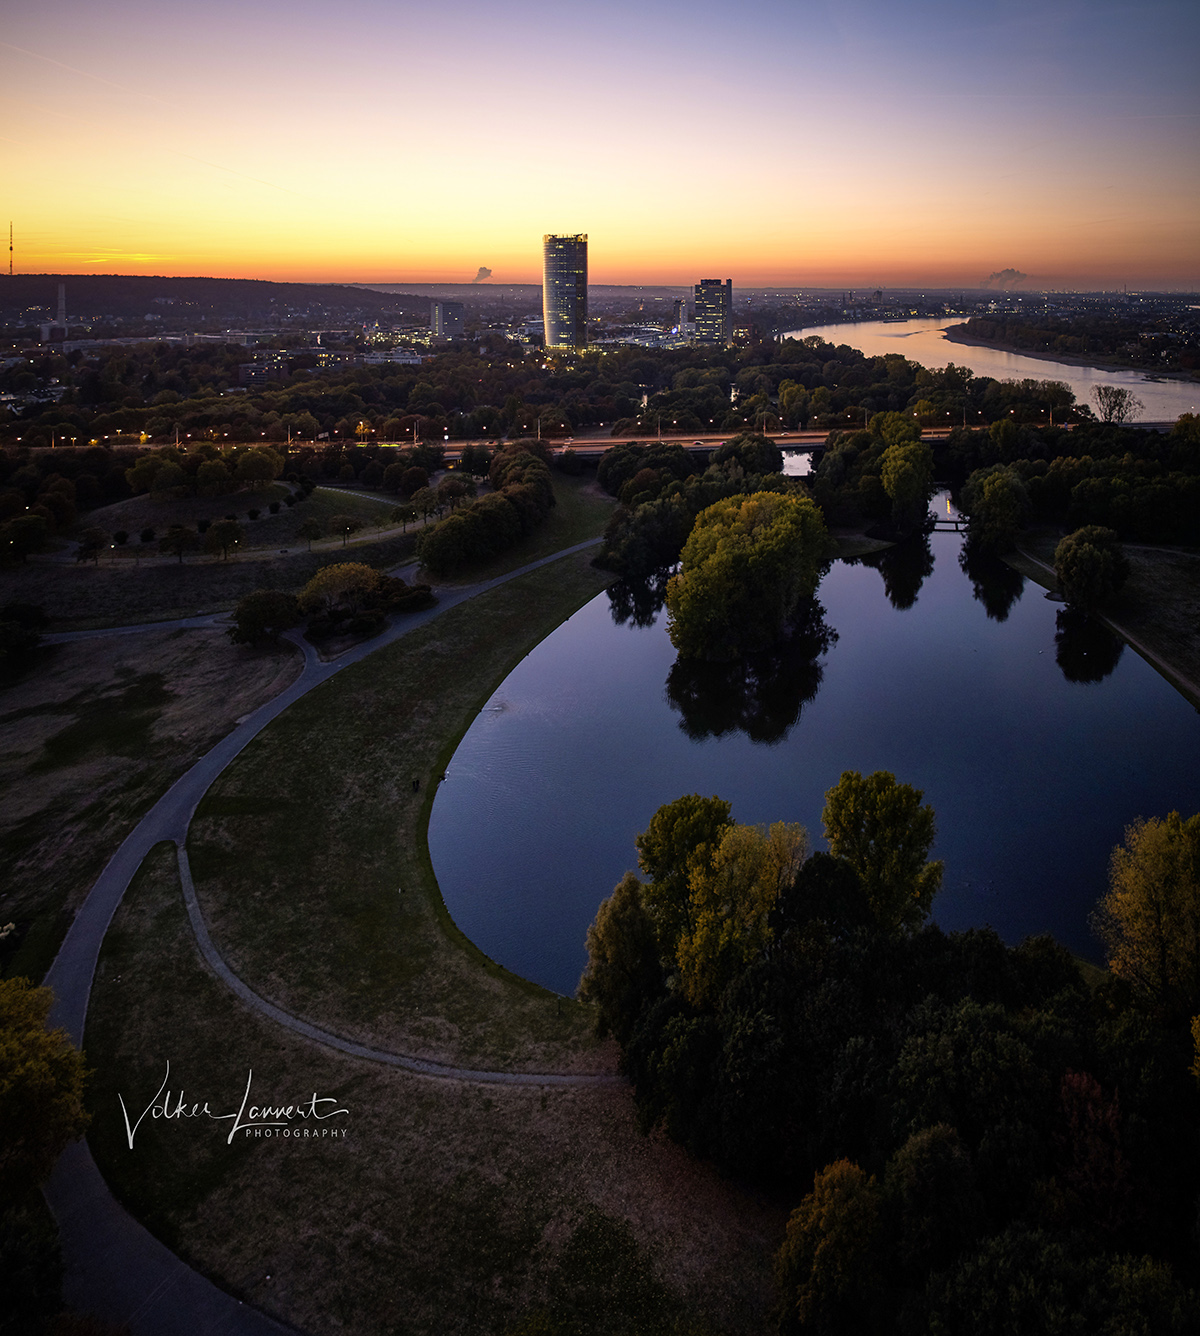 Sonnenuntergang über dem Rheinauensee am 04.10.18